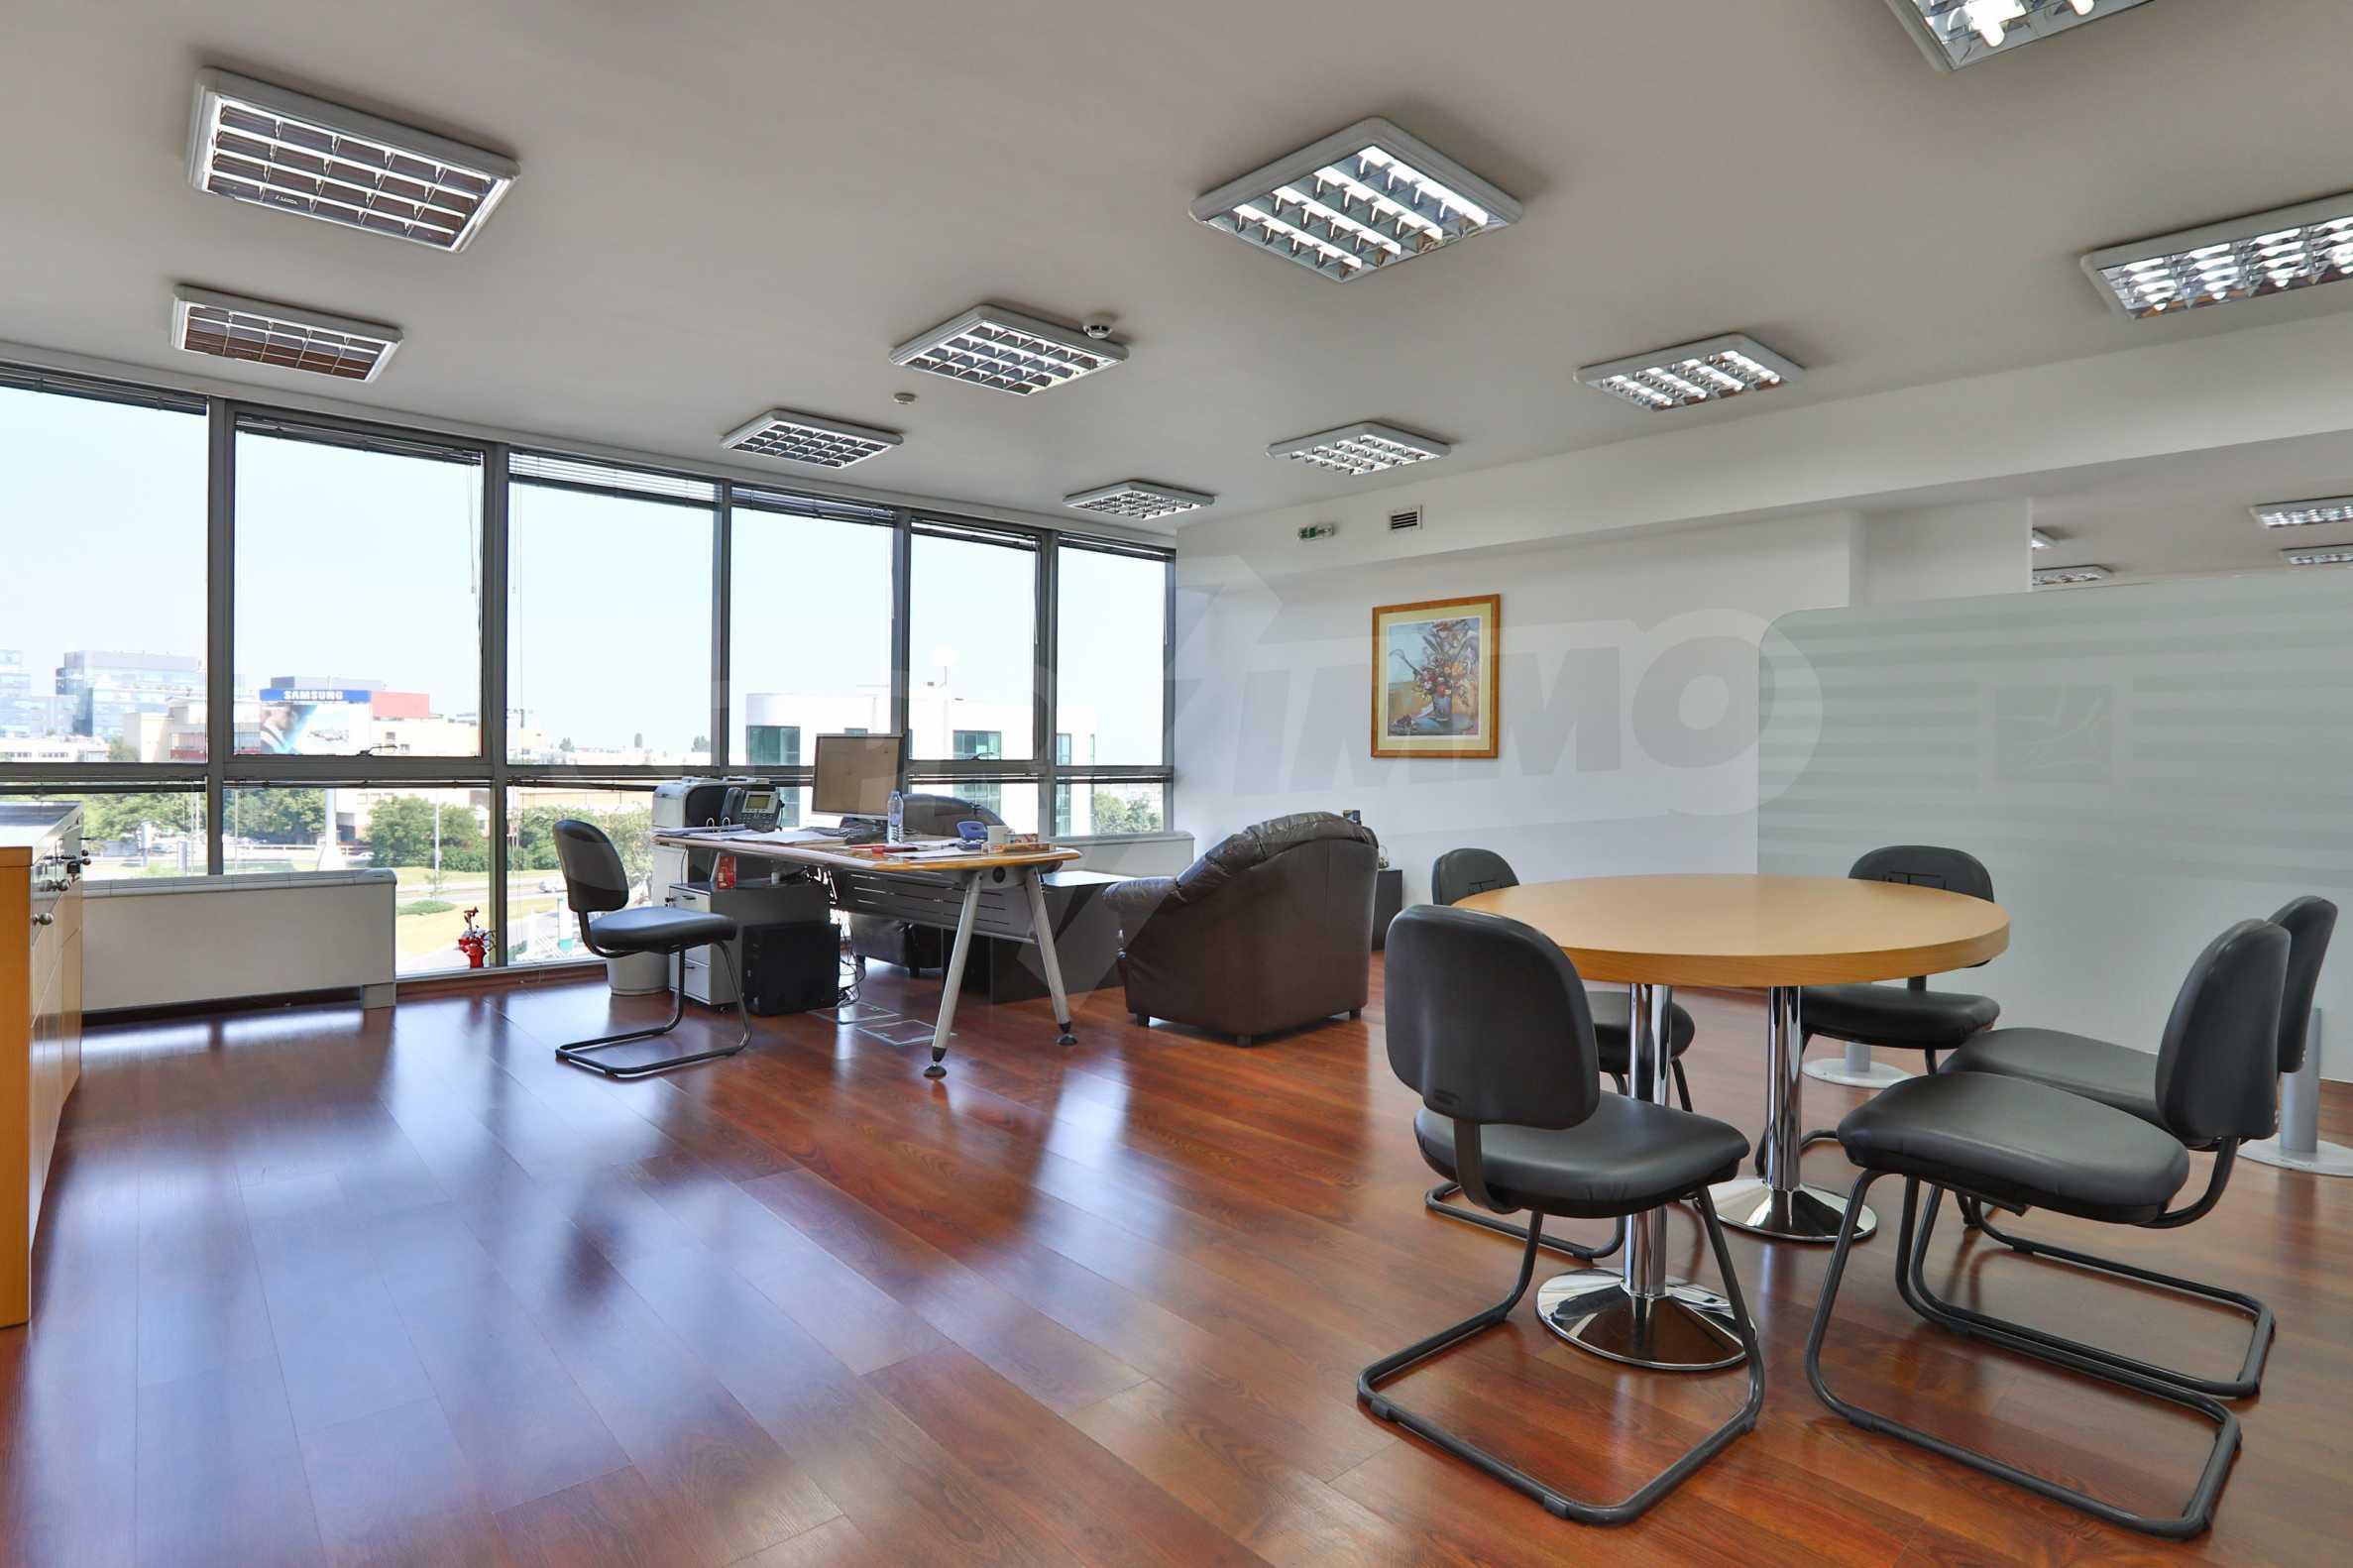 Офис в бизнес сграда висок клас на бул. Цариградско шосе 31